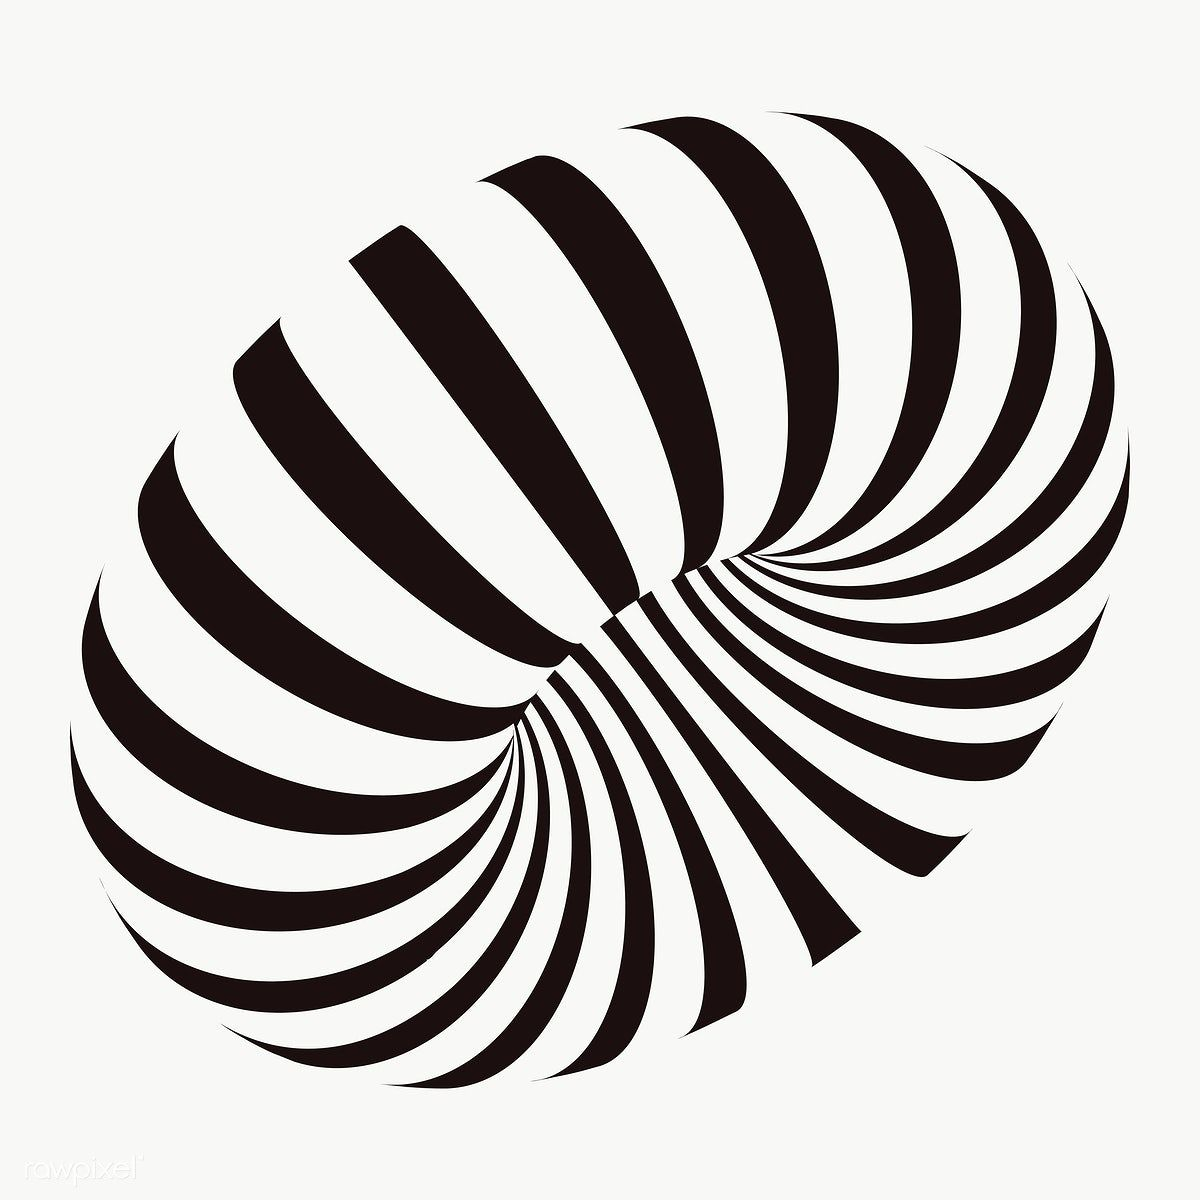 Black Torus 3d Shape Transparent Png Premium Image By Rawpixel Com Aew Flower Stencil Patterns Vector Background Pattern Geometric Stencil